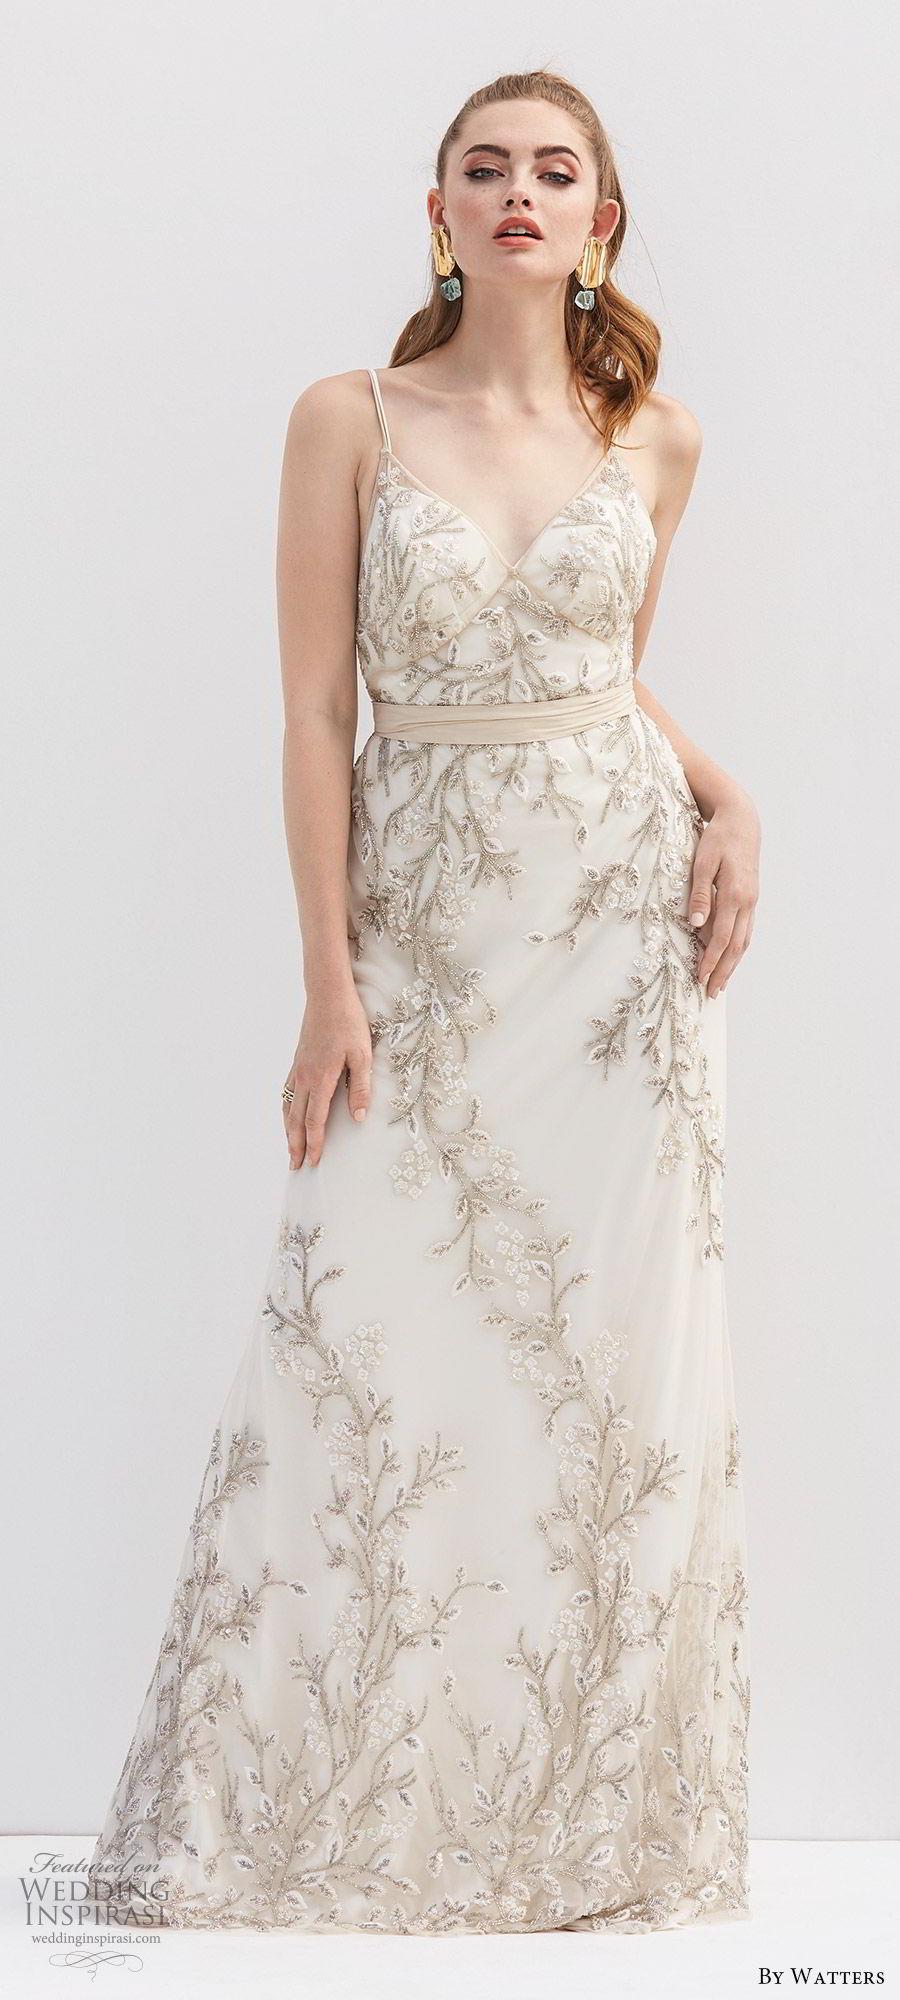 by watters 2020 bridal sleeveless thin straps v neck lace fully beaded a line wedding dress (10) sash belt romantic elegant mv